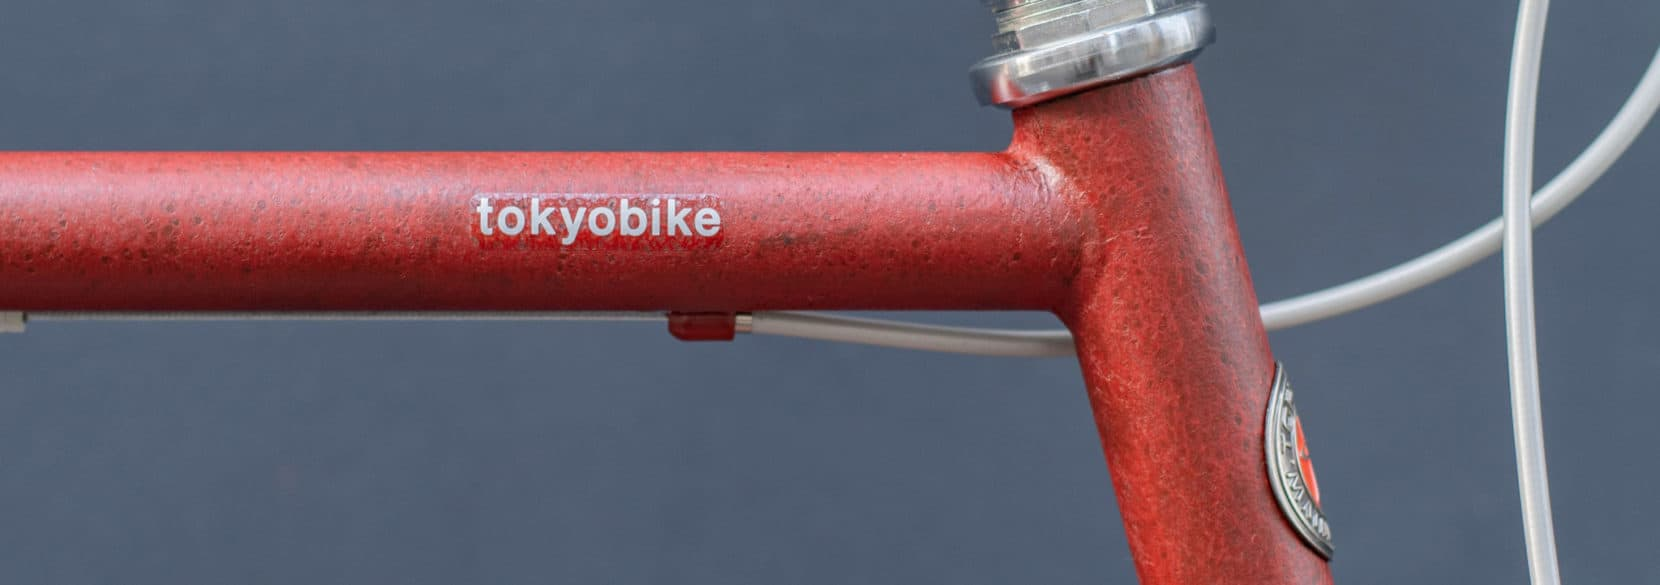 tokyobike トーキョーバイク TOURISTORE